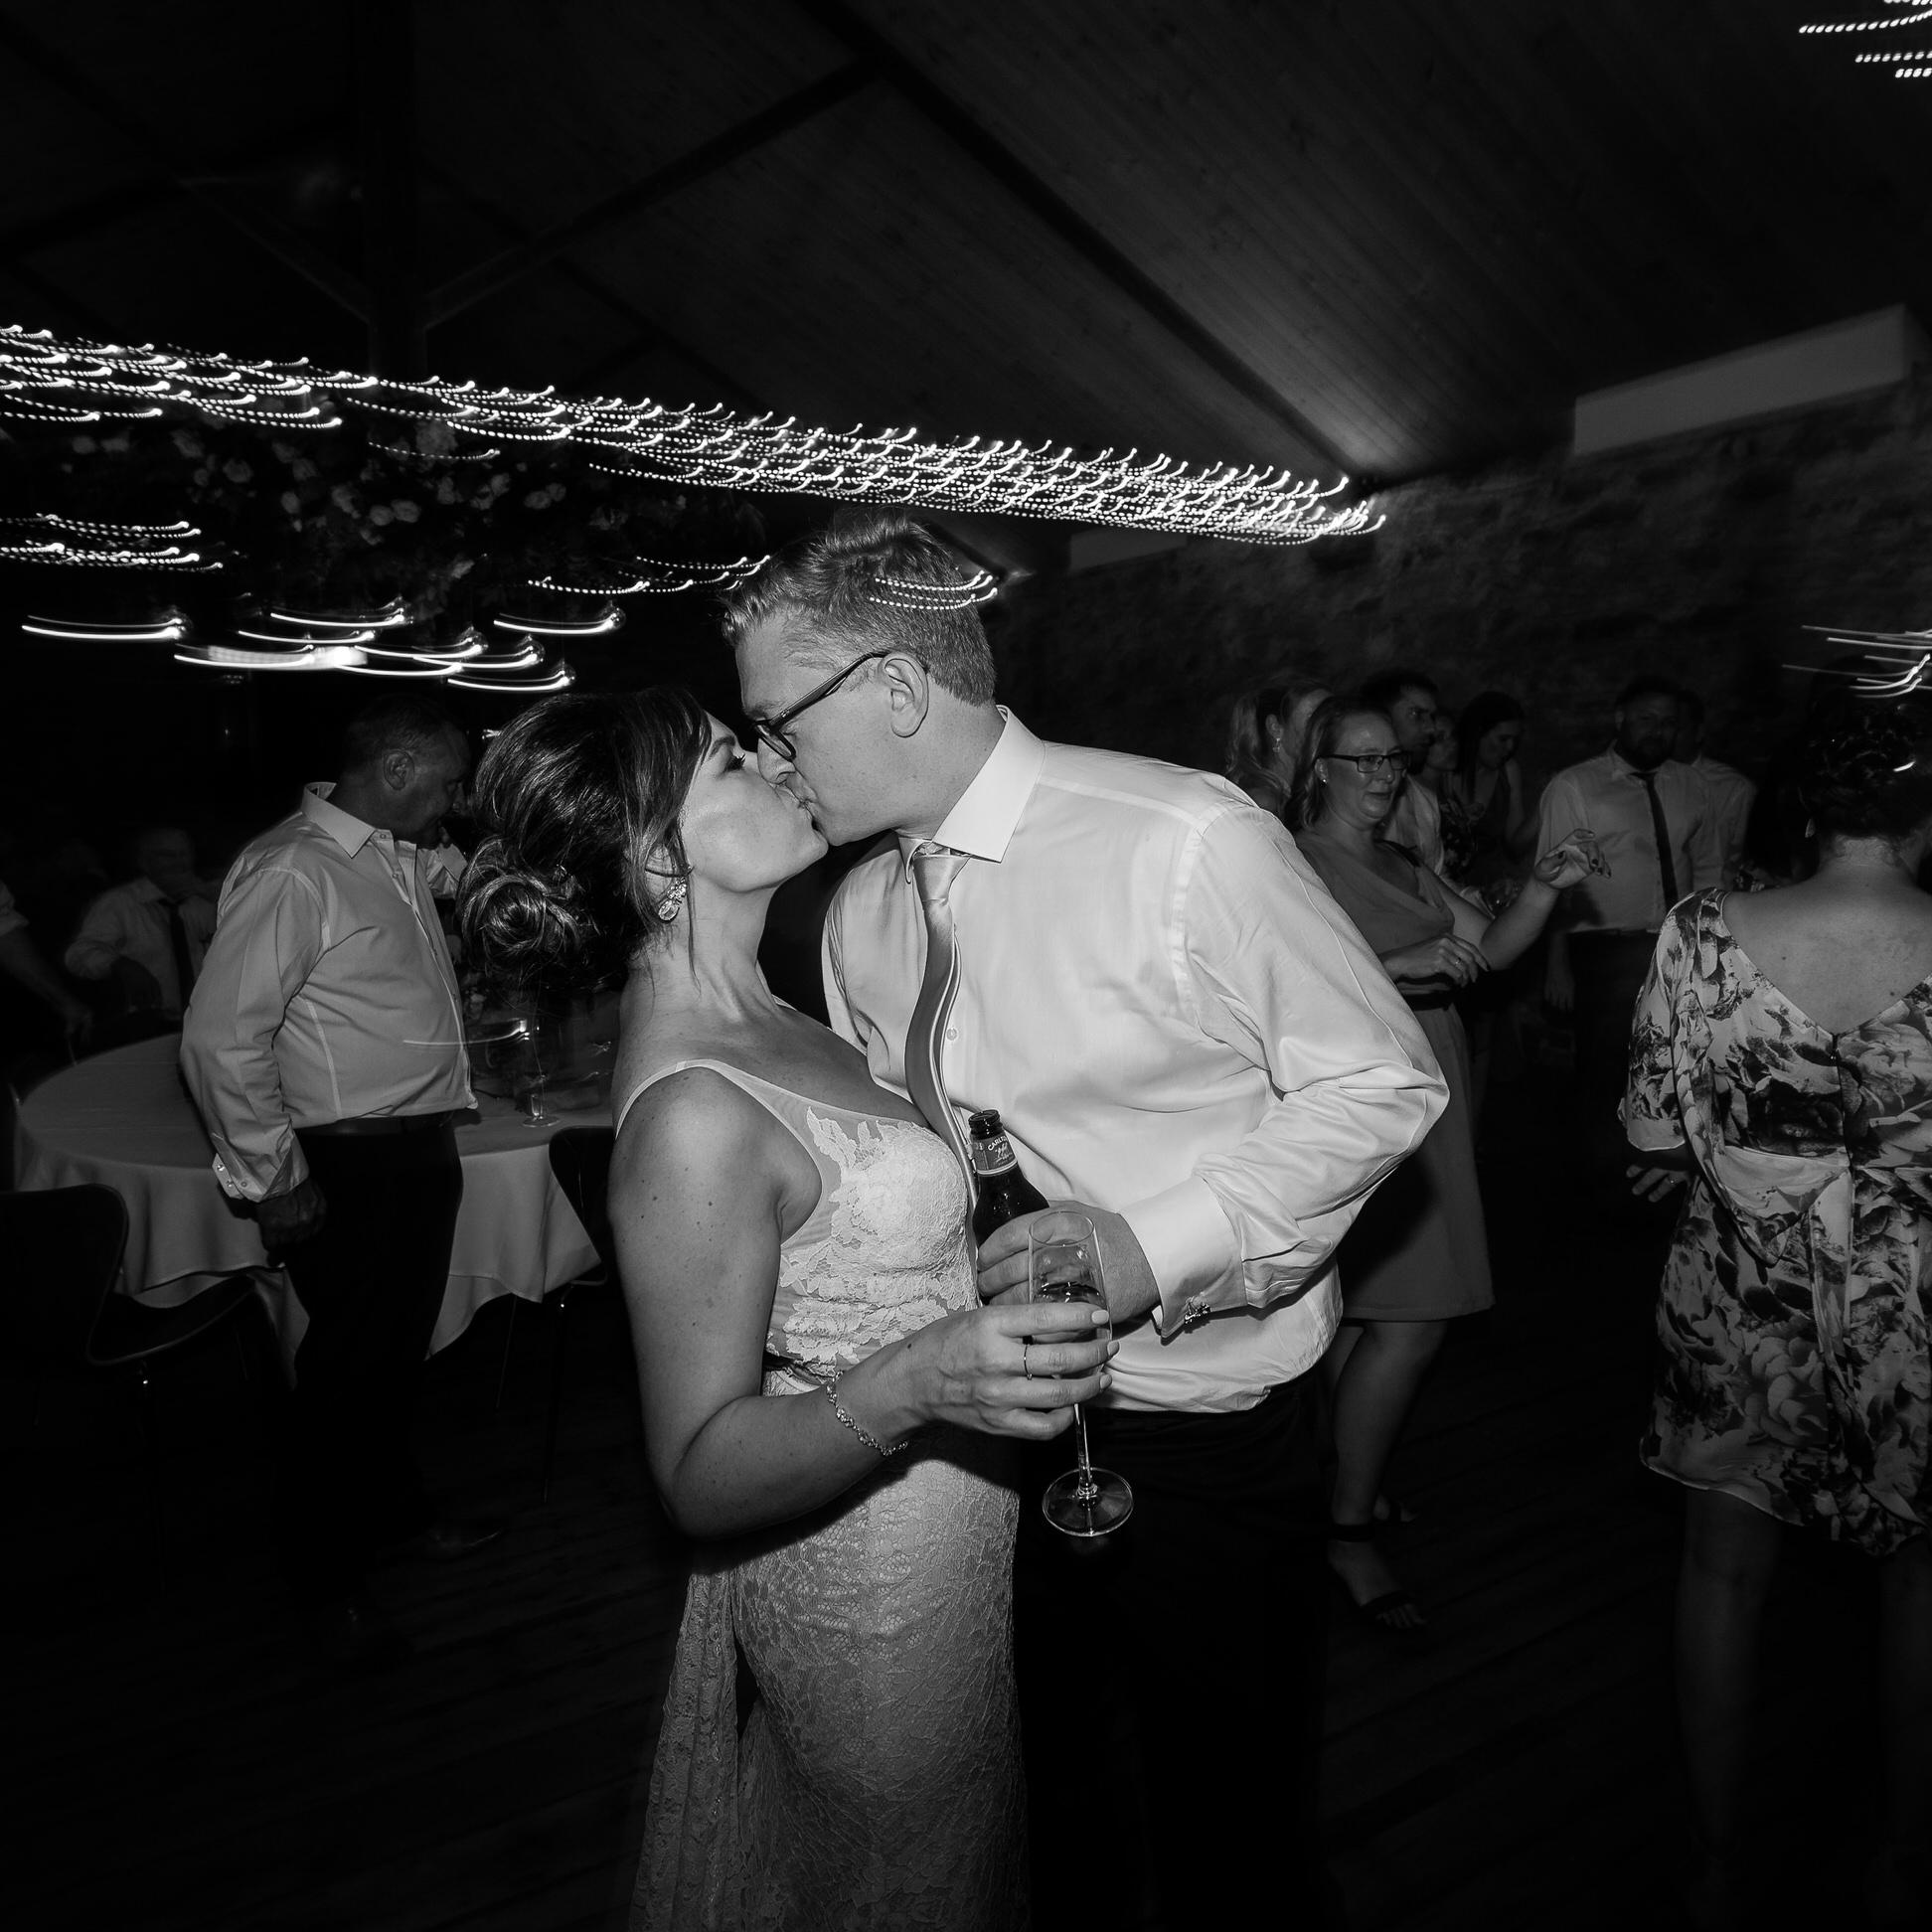 Justin_And_Jim_Photography_Chateau_Dore_Bendigo_Wedding117.JPG